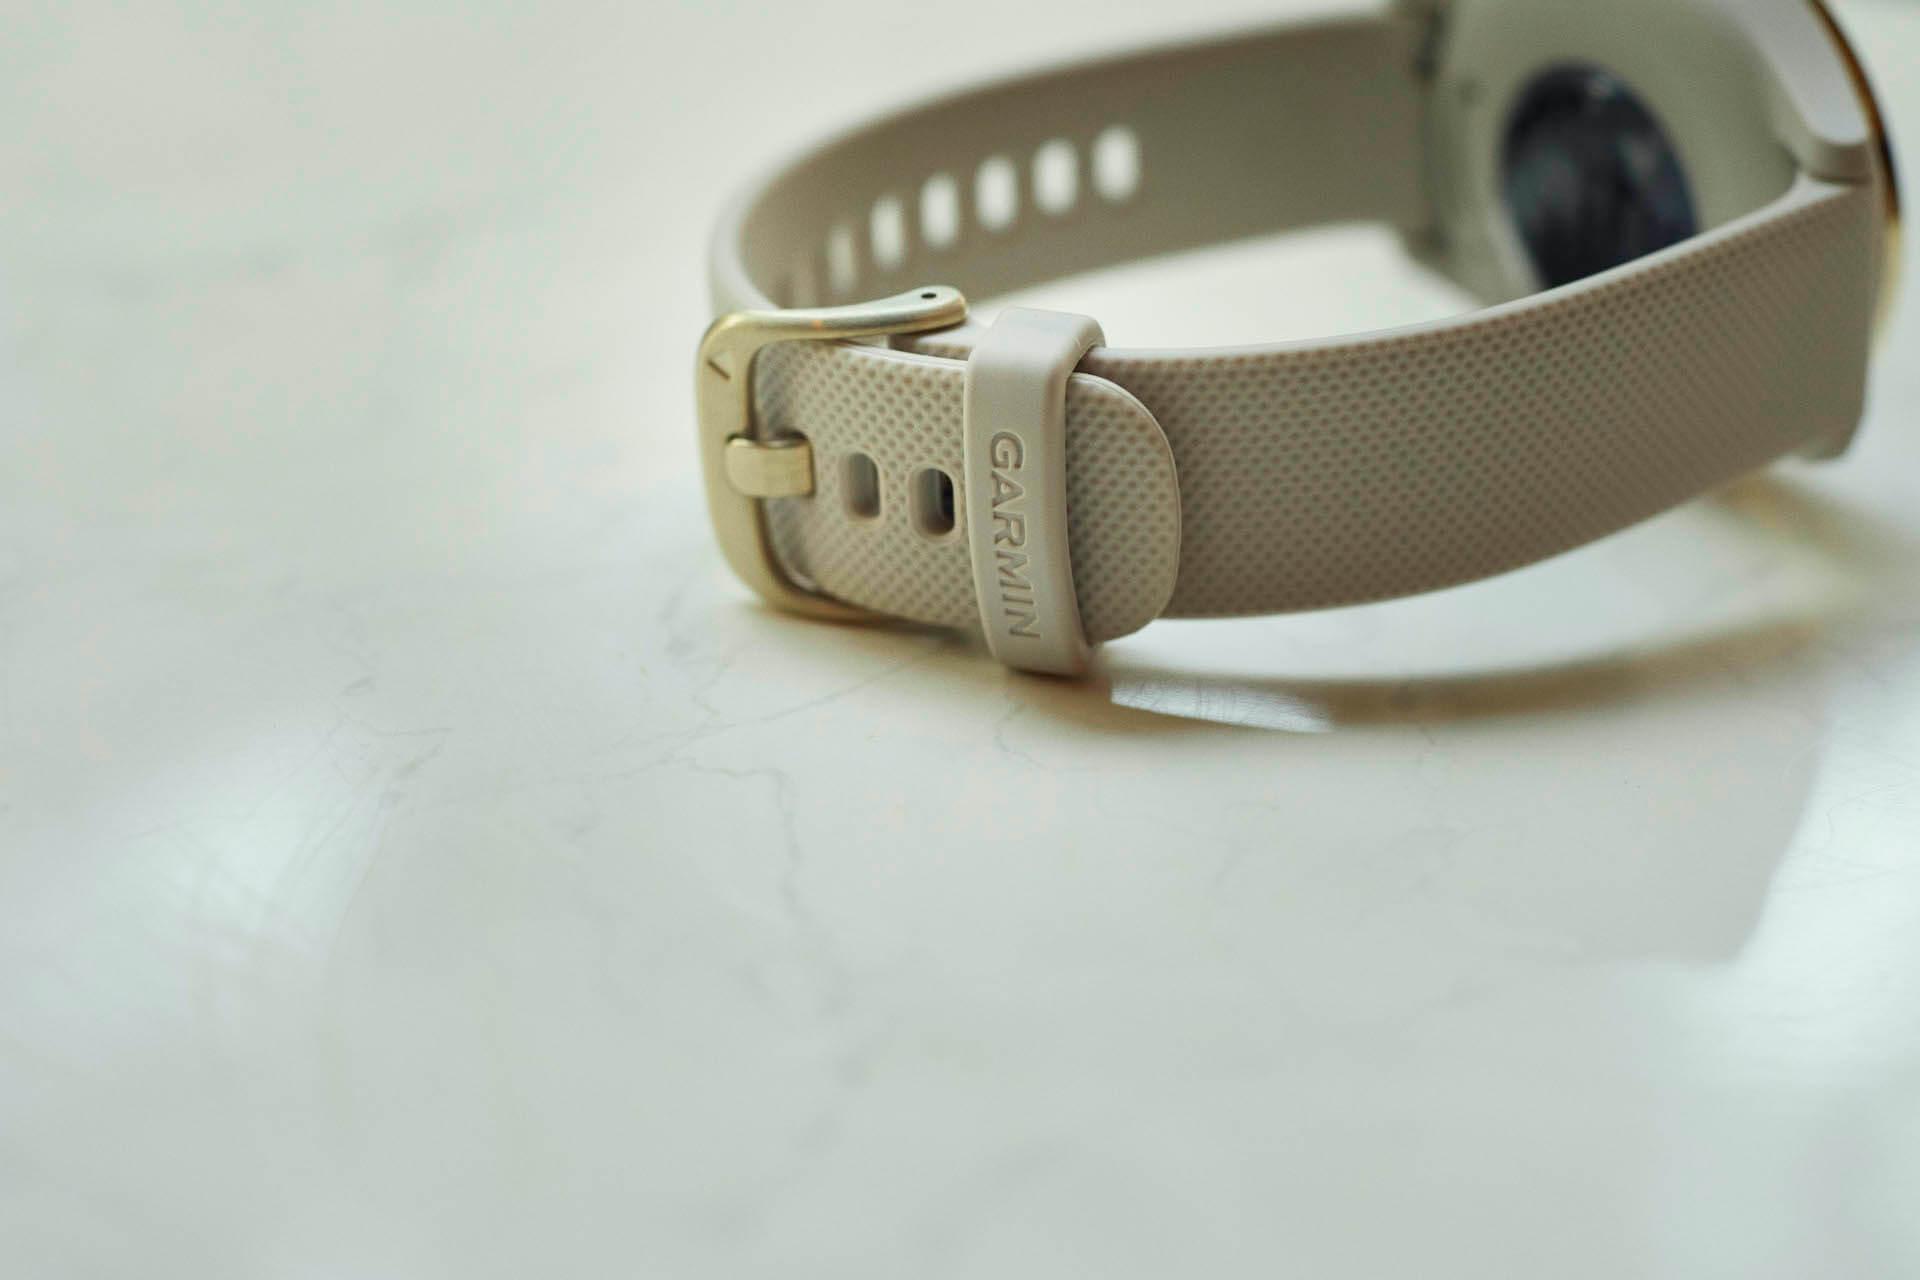 emmi×Garmin スマートウォッチ「vívomove 3S」の別注モデルが登場!ベージュとゴールドの洗練されたカラーリング lf200525_emmi_garmin_smartwatch_04